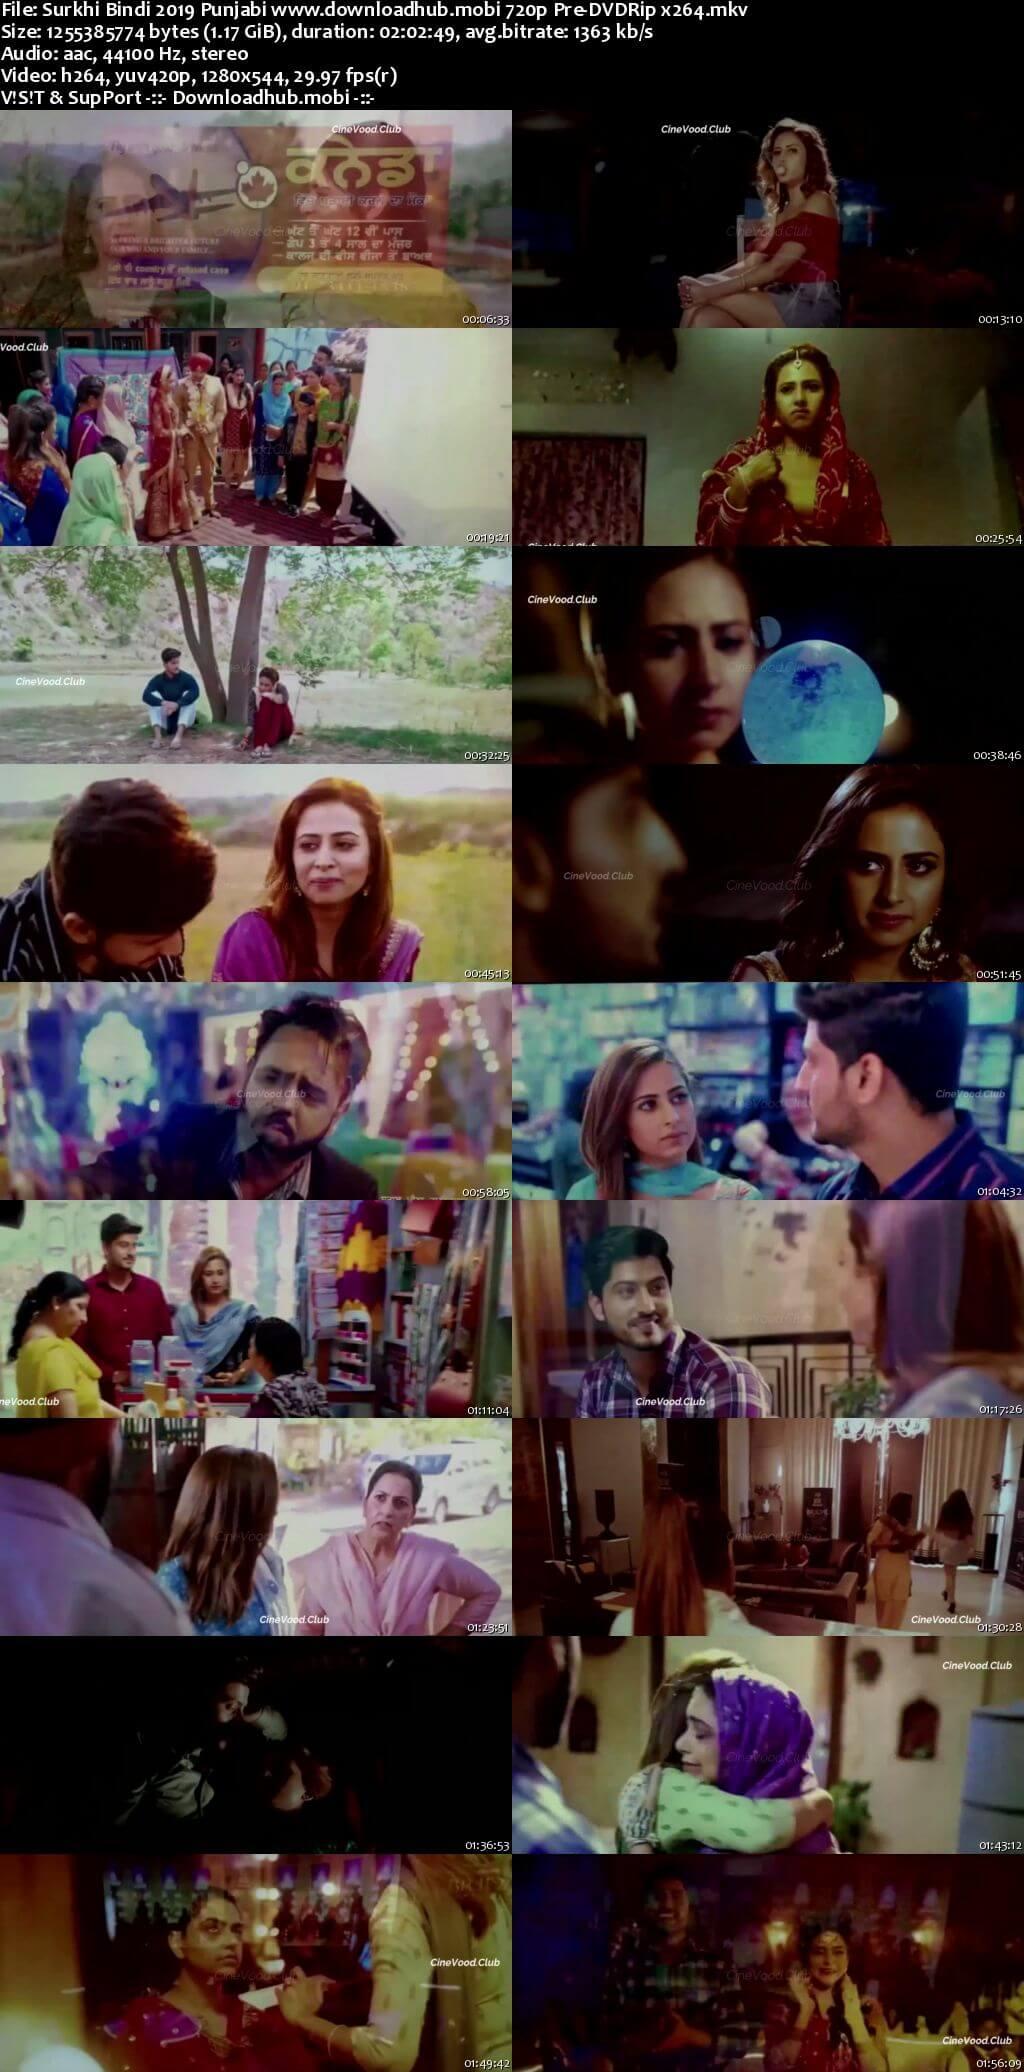 Surkhi Bindi 2019 Punjabi 720p Pre-DVDRip x264